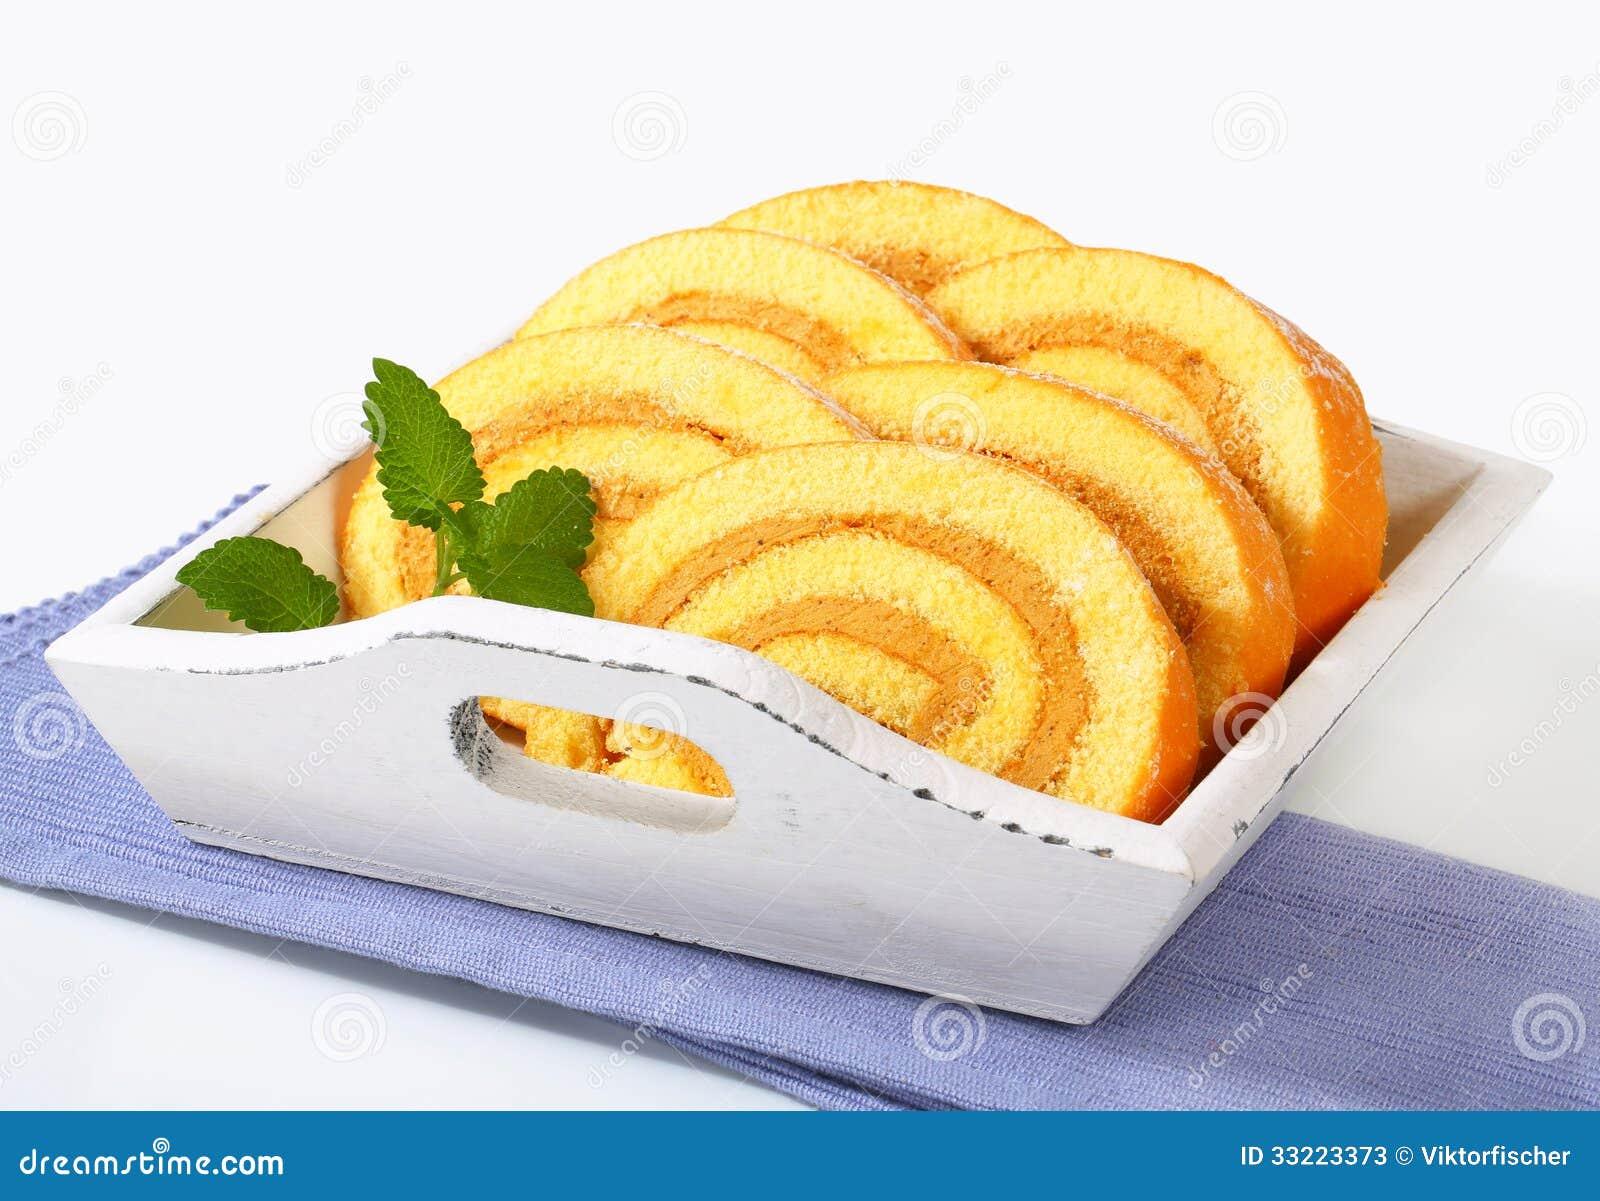 Mocha Sponge Cake Roll